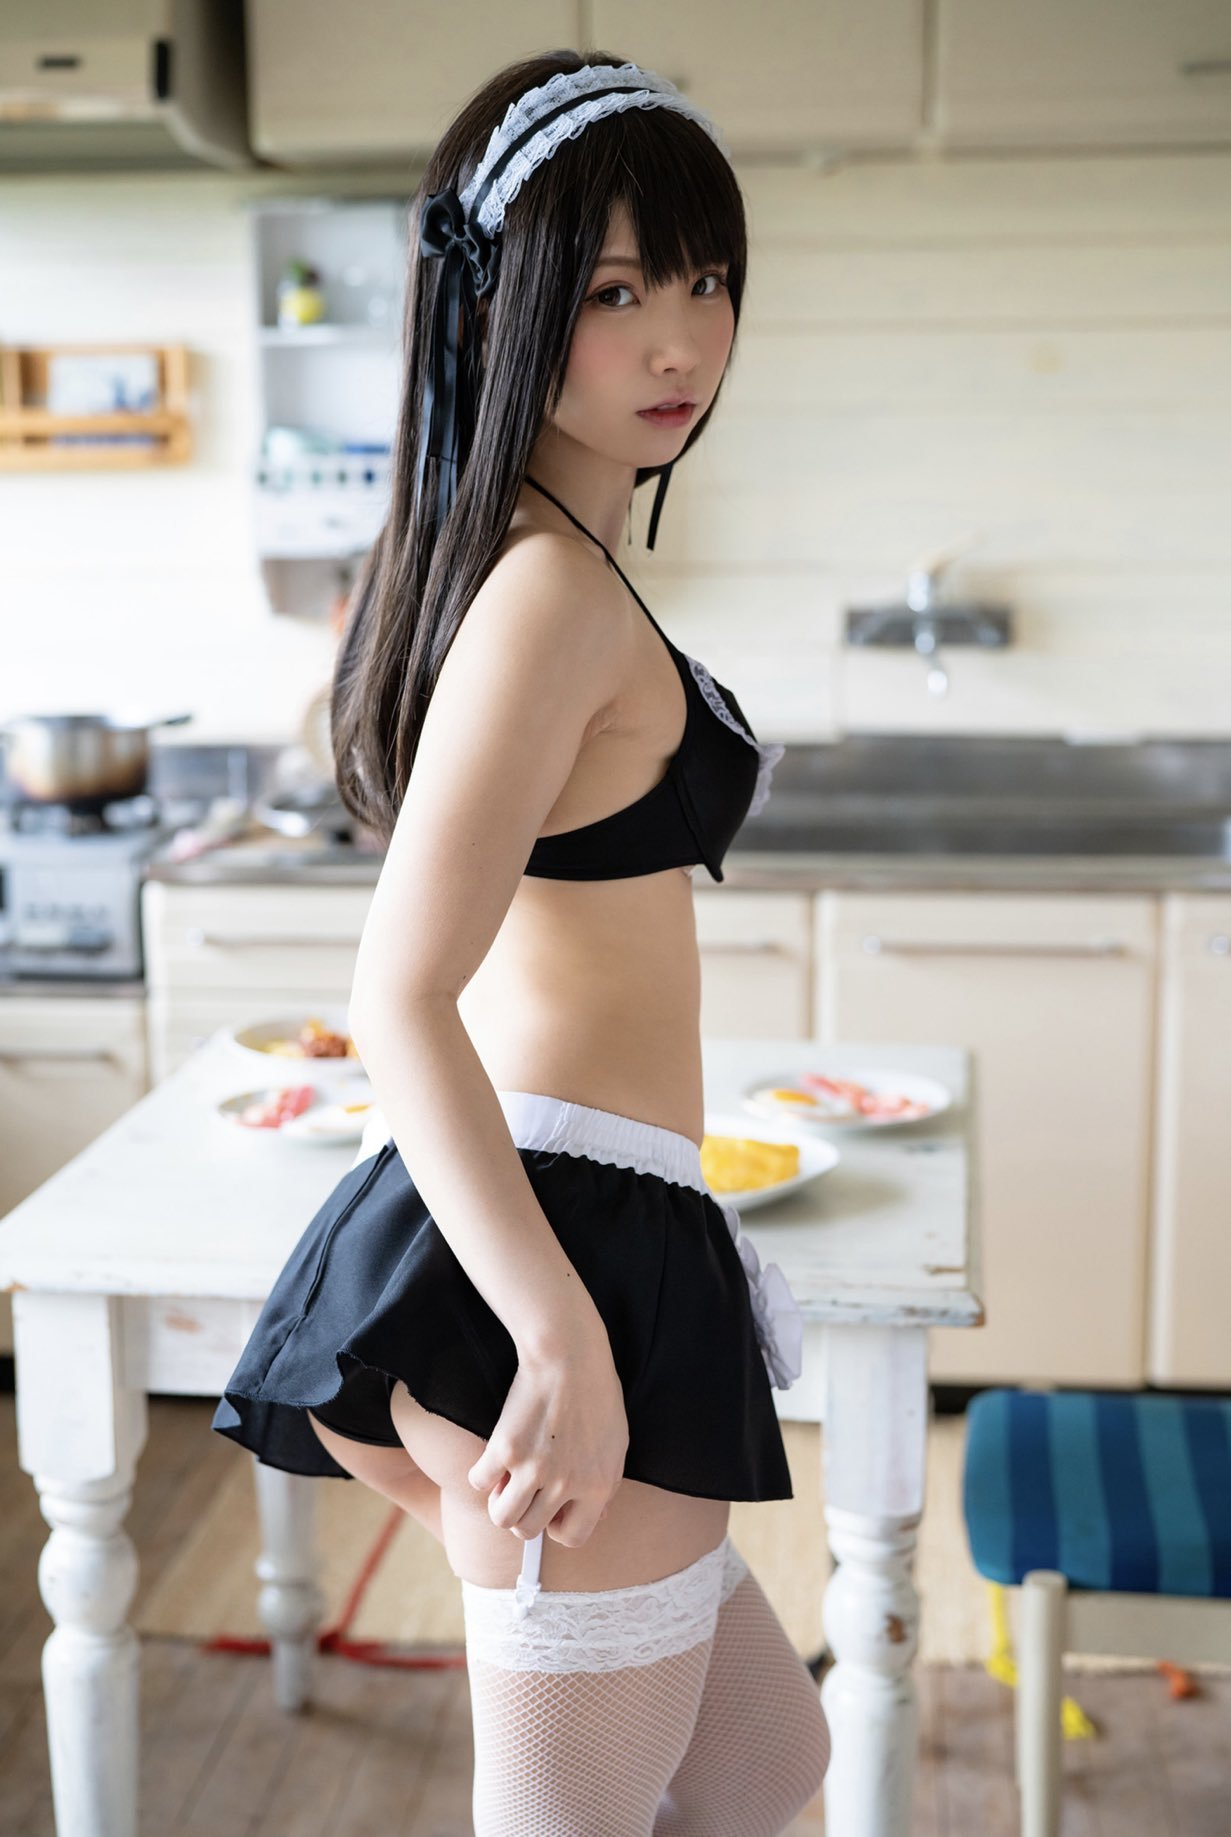 People 1231x1837 Japanese women women Asian lingerie fishnet stockings garter belt garter straps maid bikini maid maid outfit